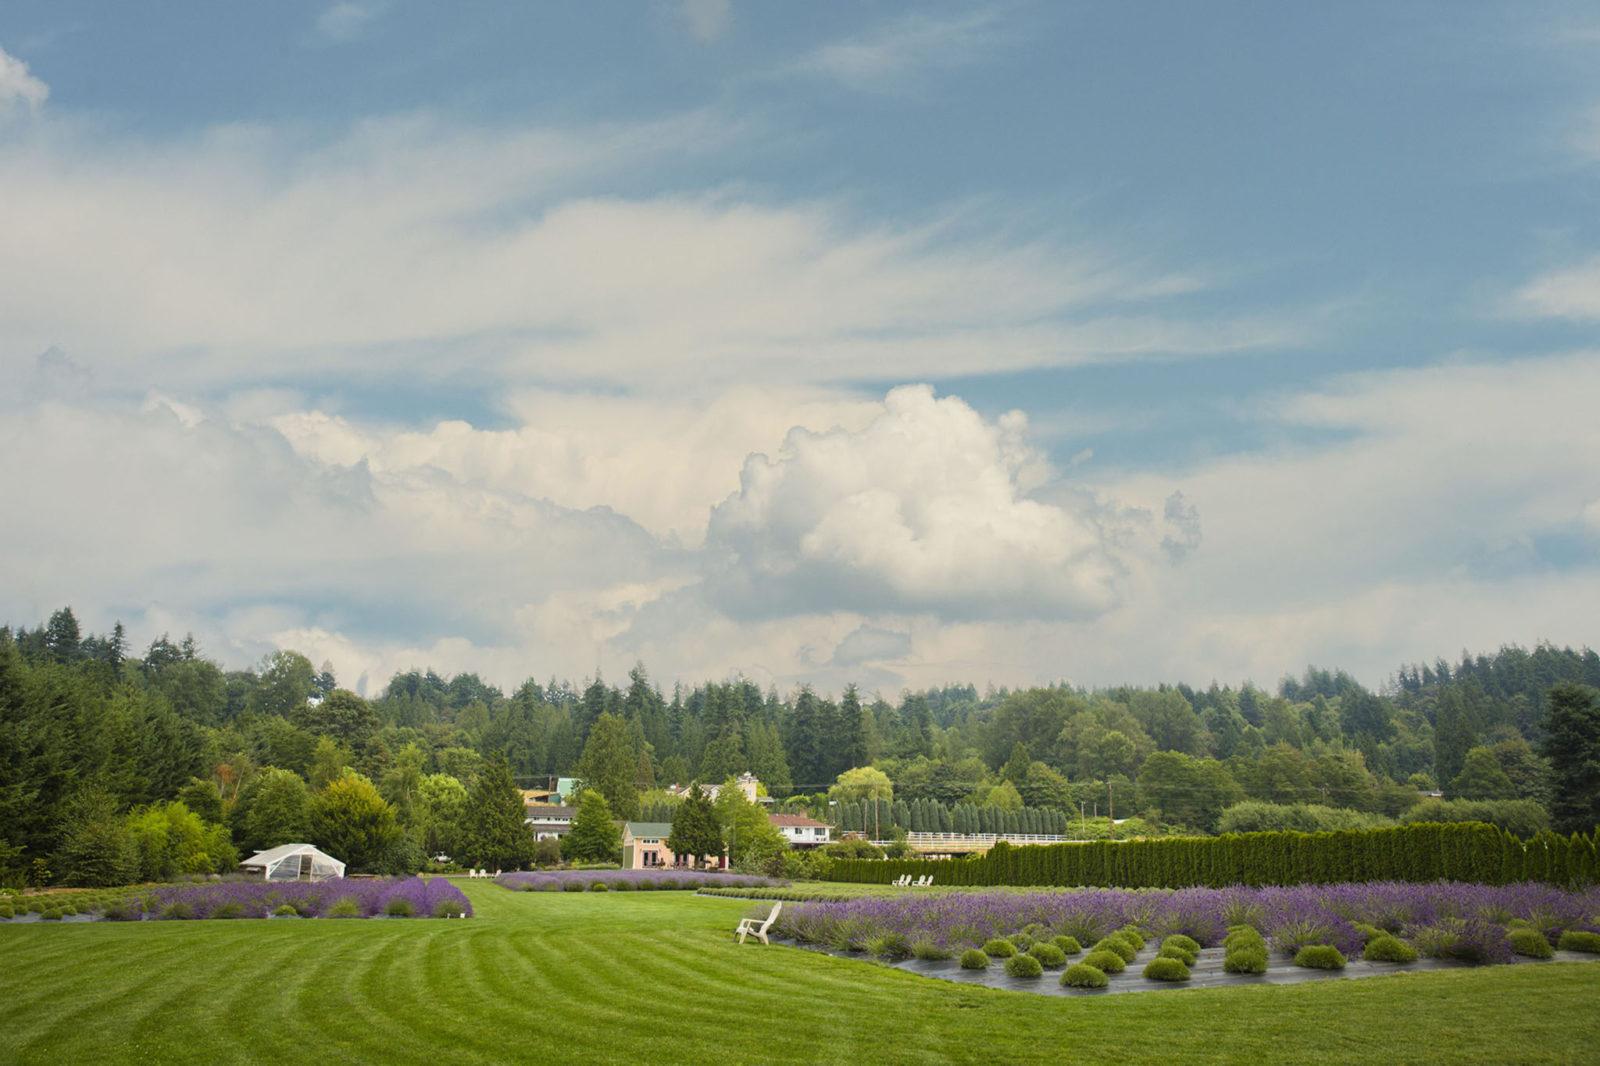 Woodinville Lavender Venue